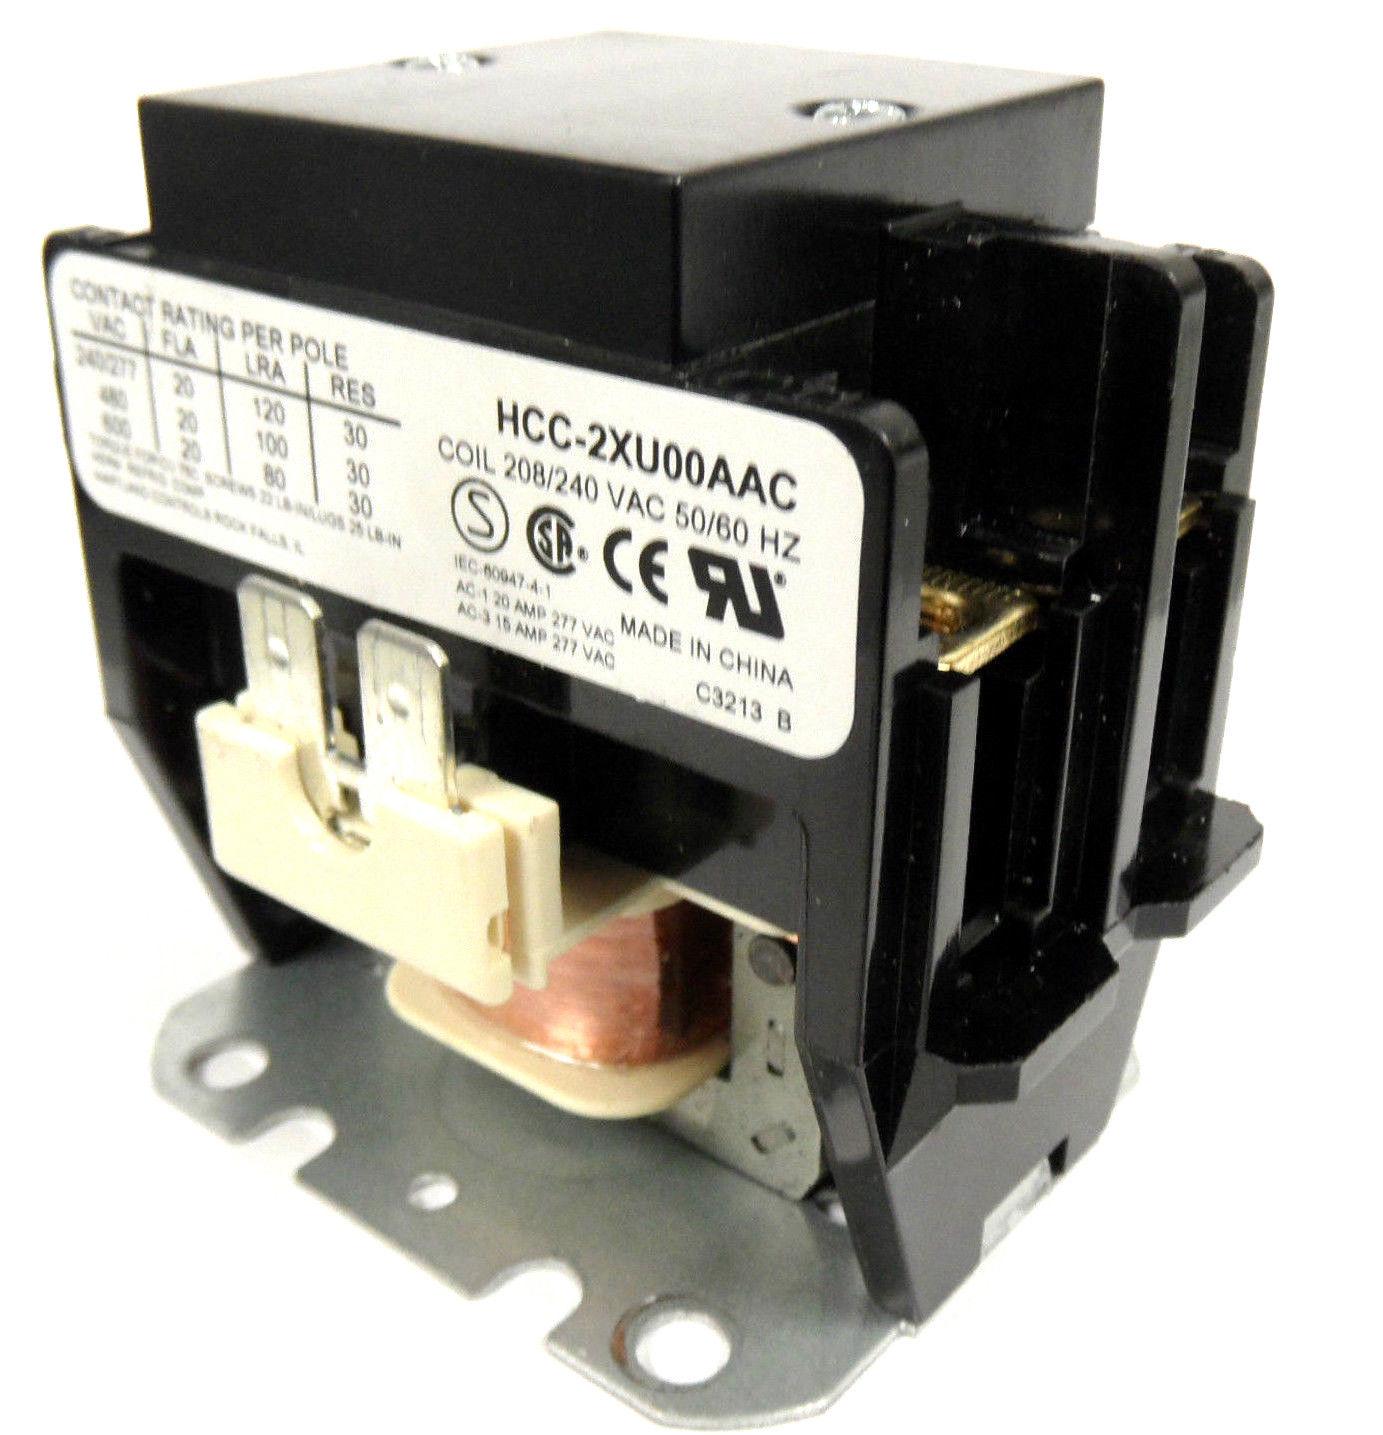 Hot Tub /& Pool Contactor220V DPST 20AMP HCC-2XU00AAC